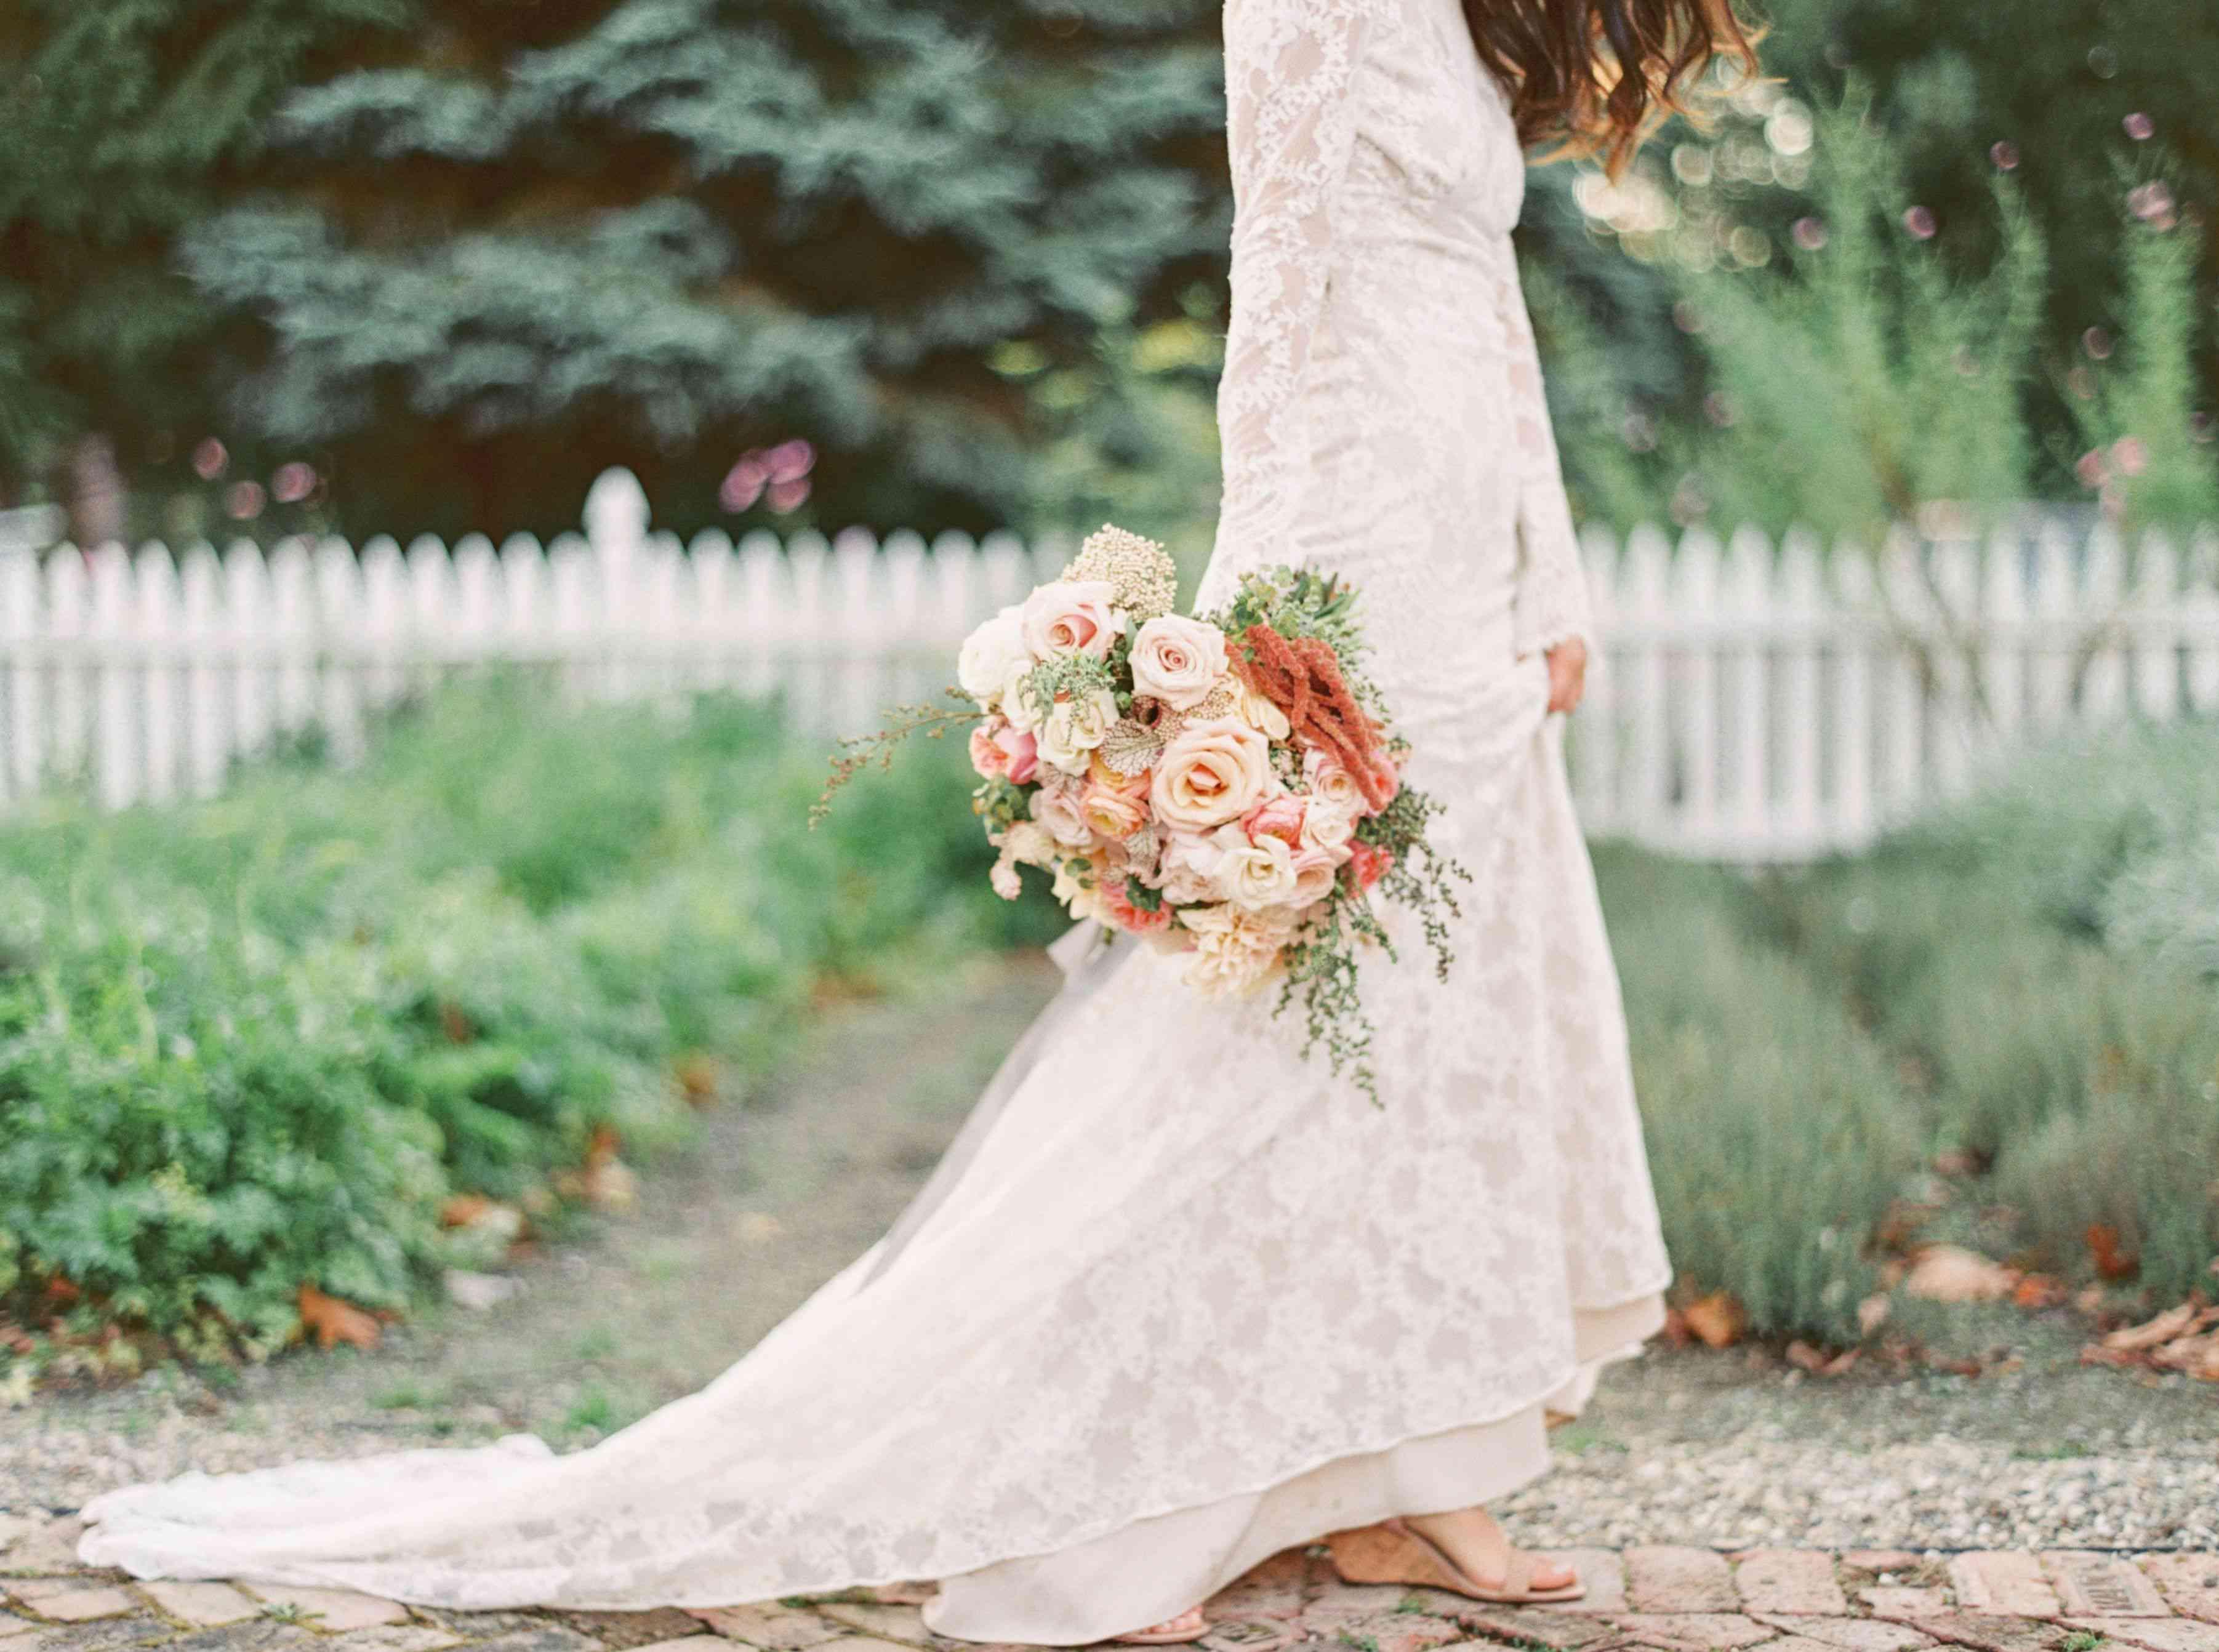 Bride holding a peach rose bouquet